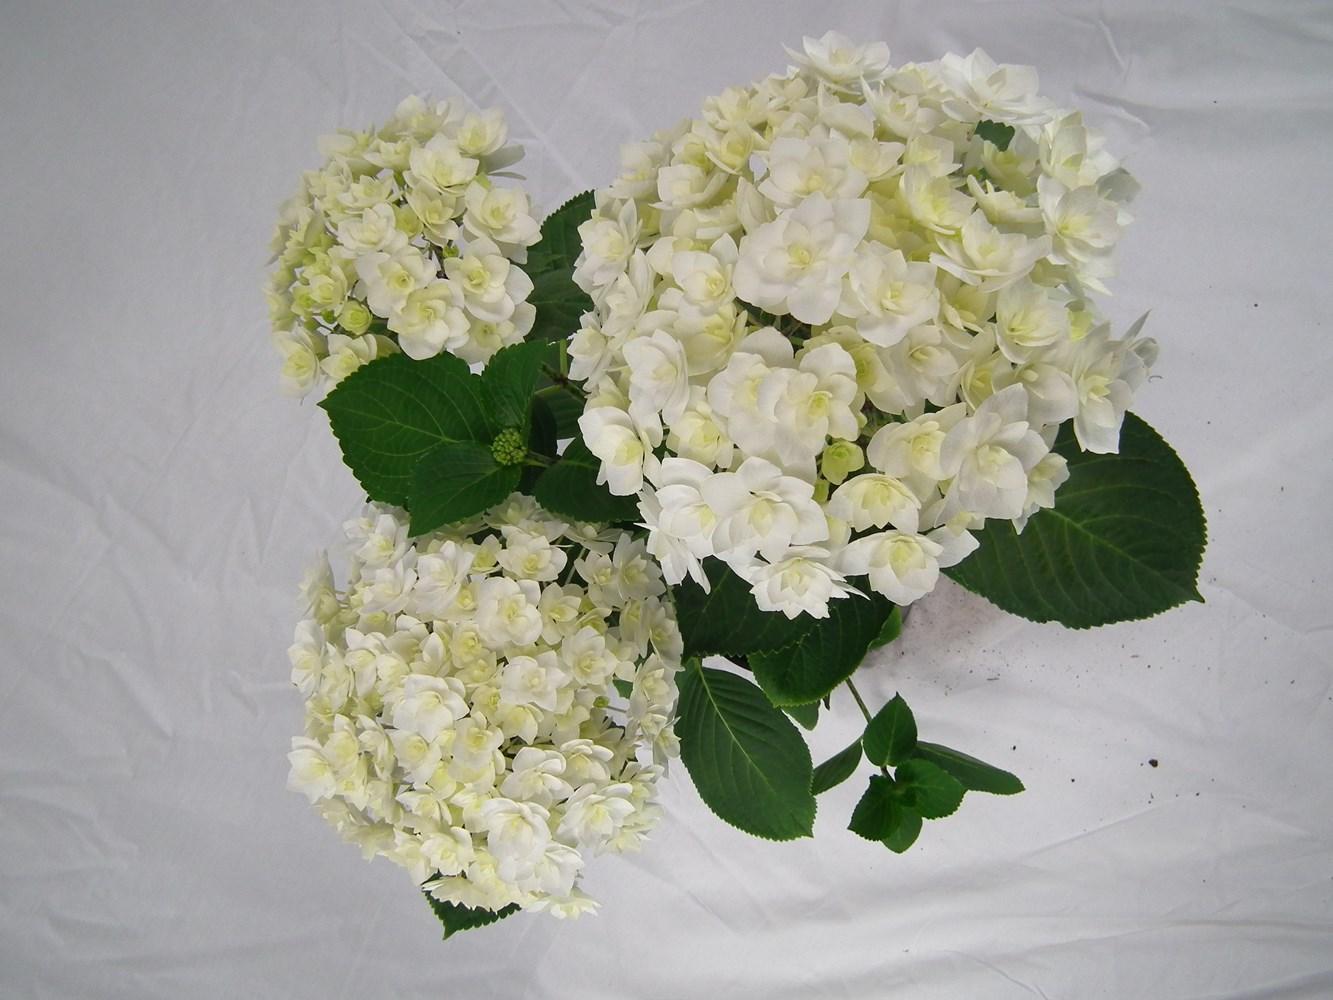 Website/Plants/2144398562/Images/Gallery/h_peace_02.0.jpg